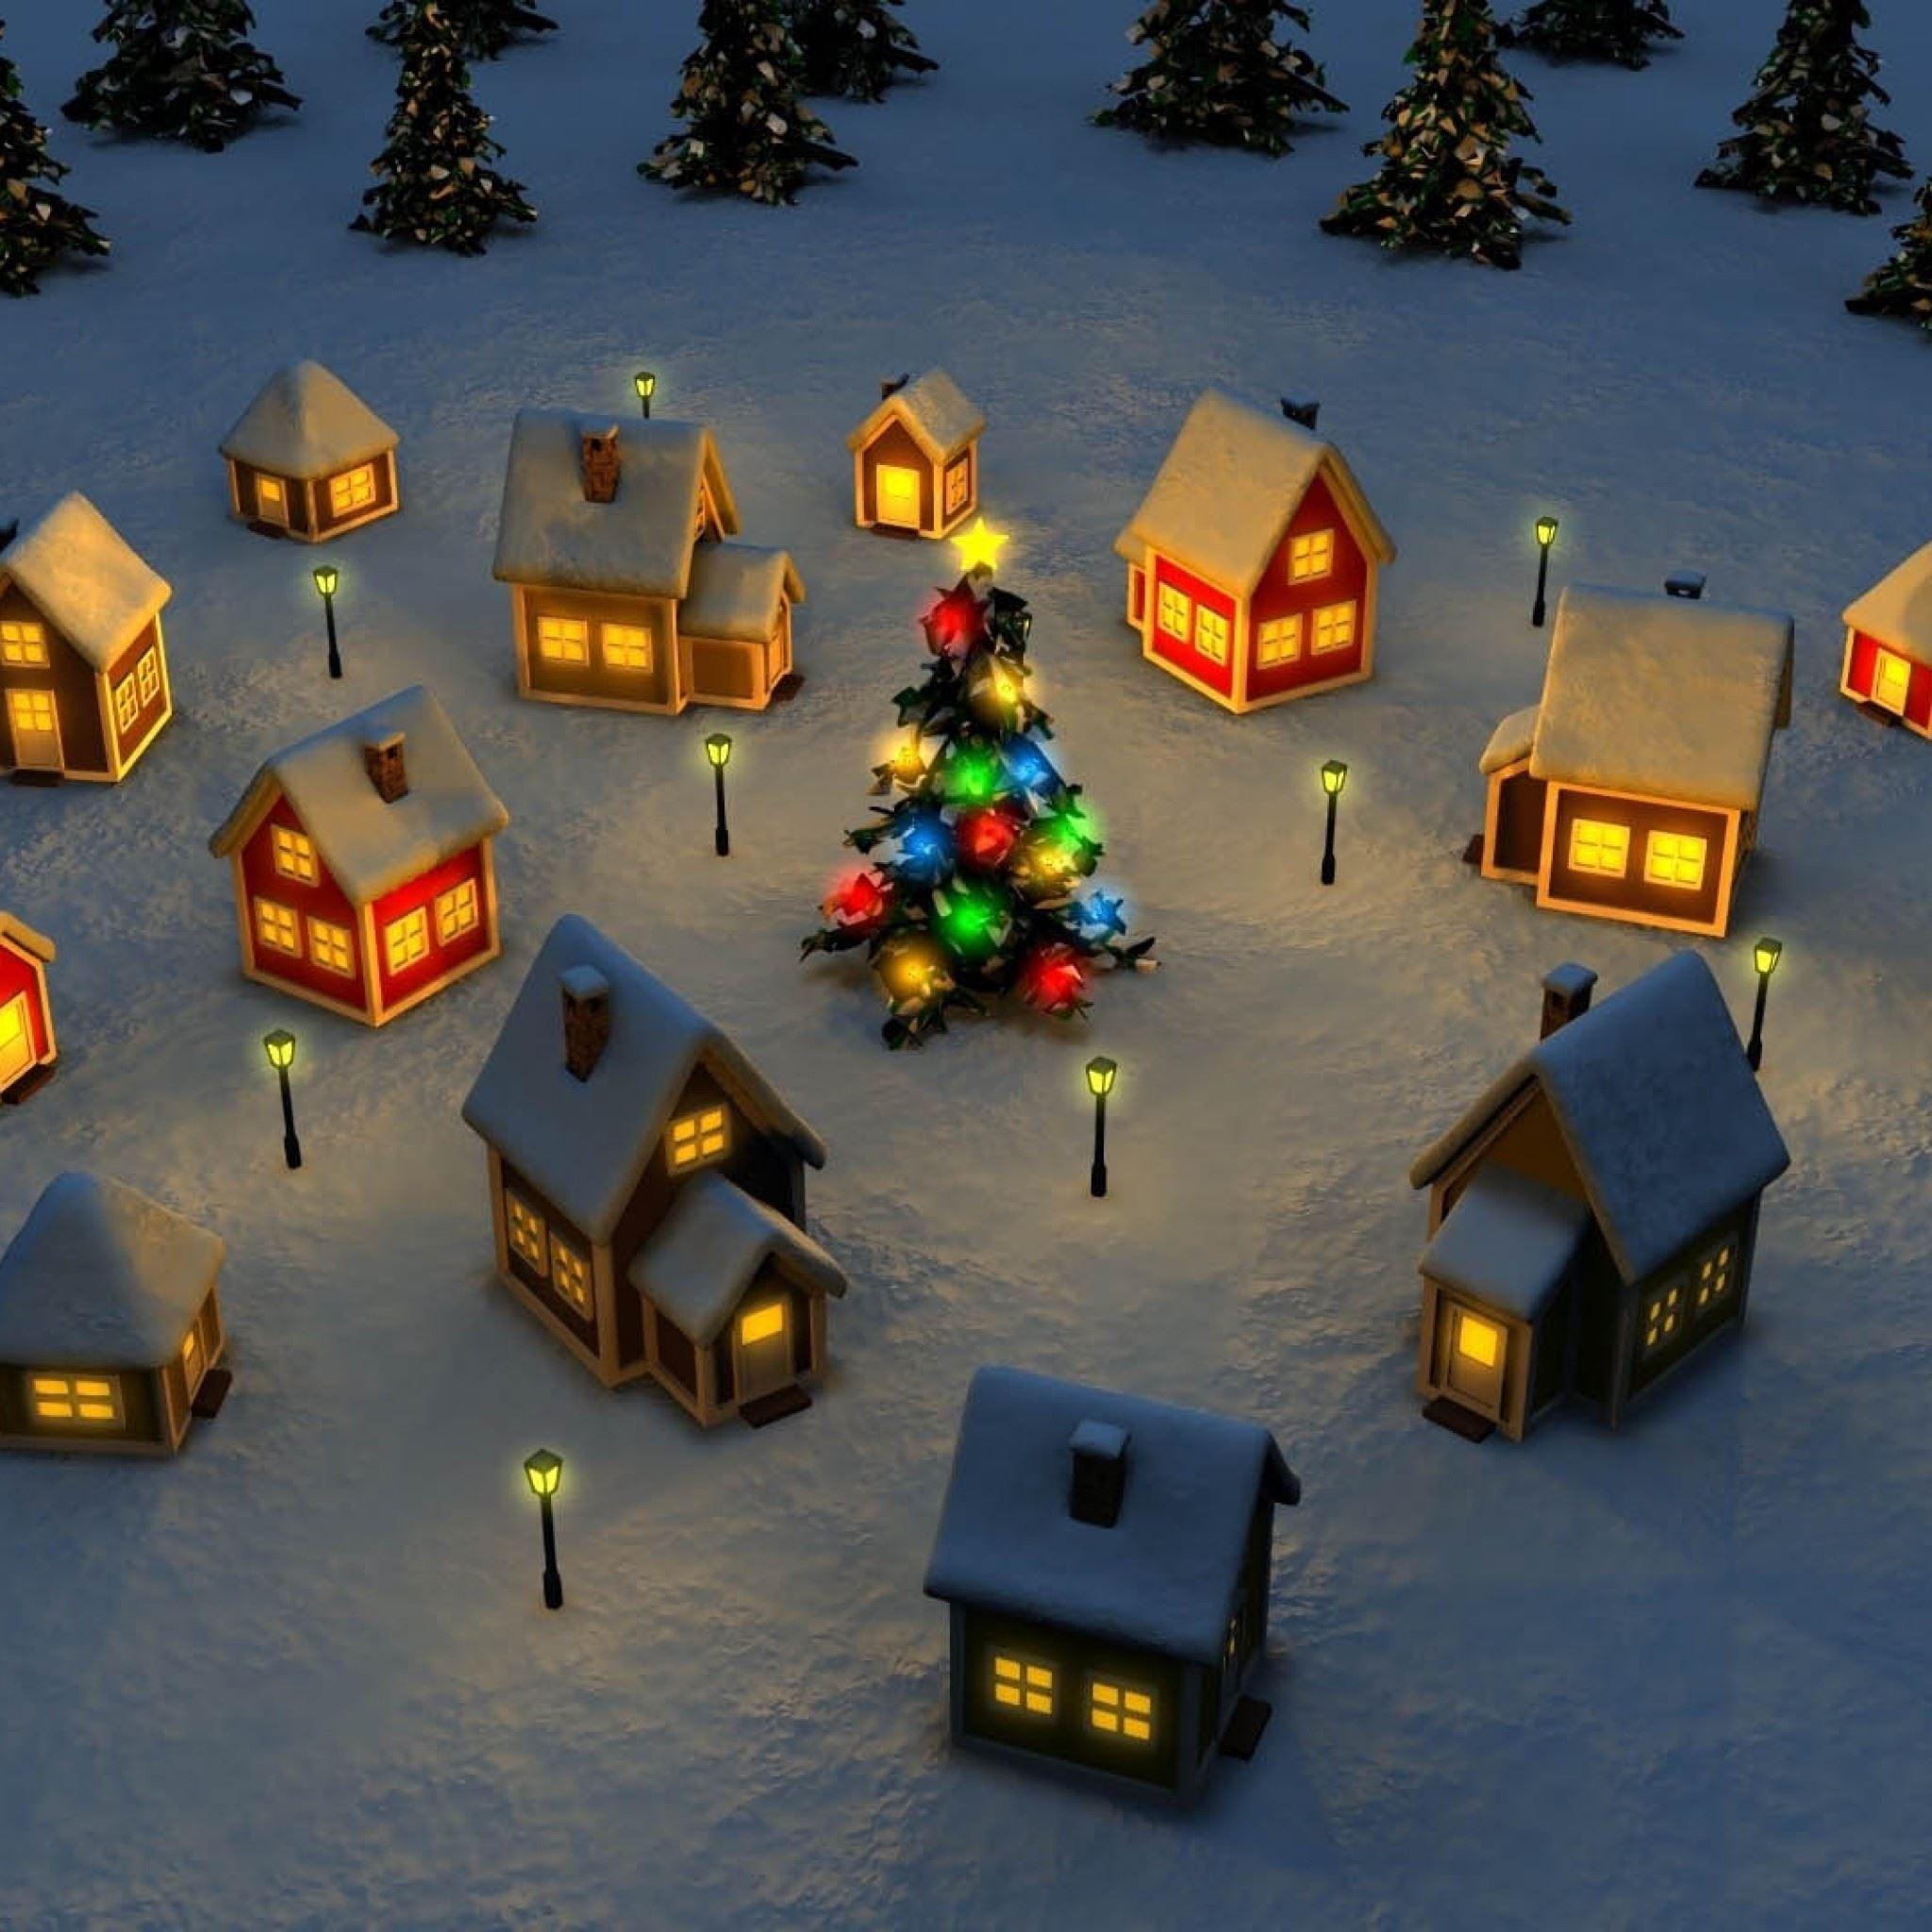 Christmas Village Illustration Ipad Air Wallpapers Free Download